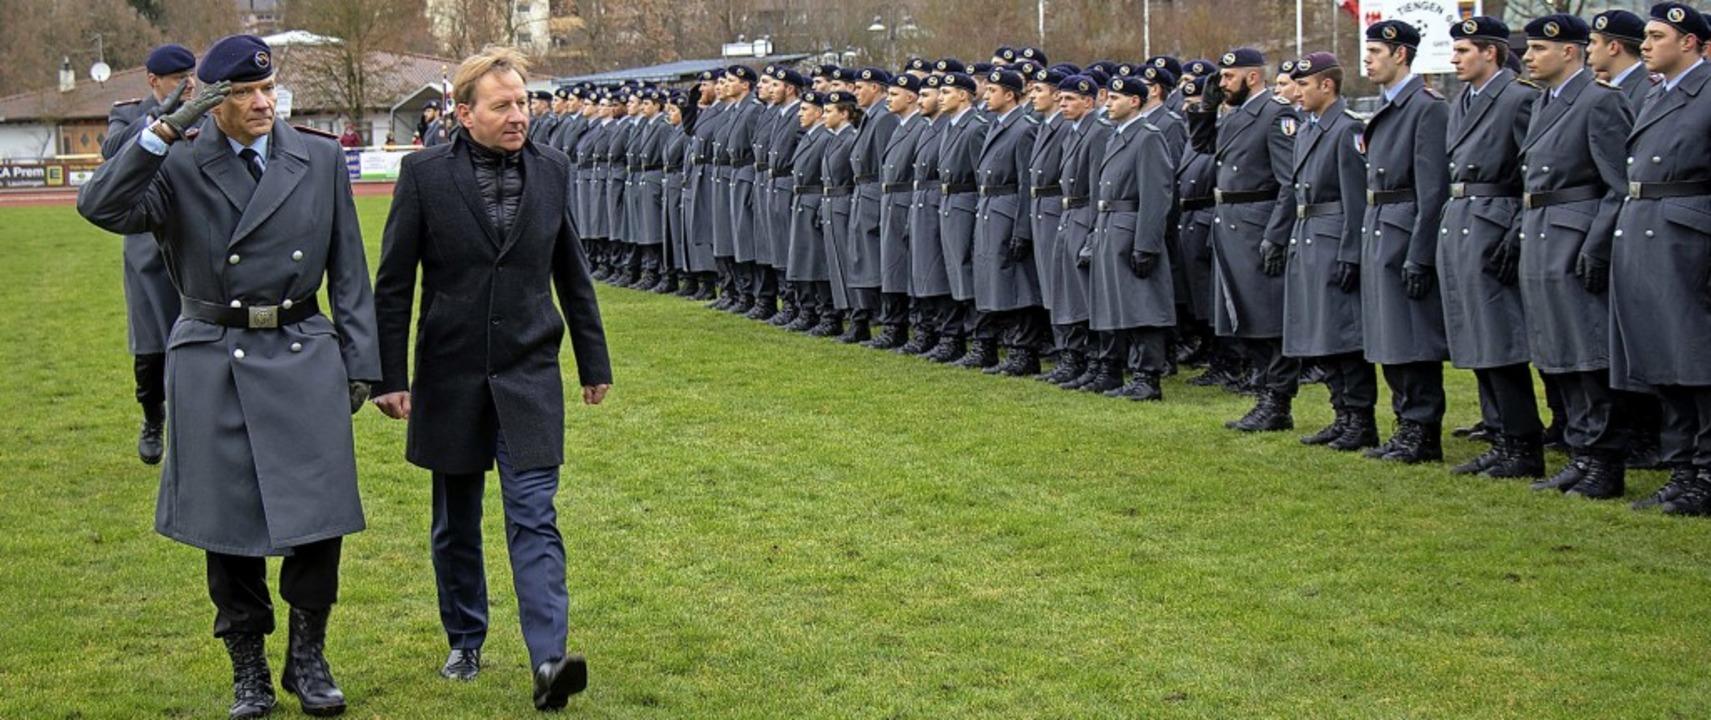 Oberbürgermeister Philipp Frank begrüß...mandeur des Artilleriebataillons 295.     Foto: Peter Rosa